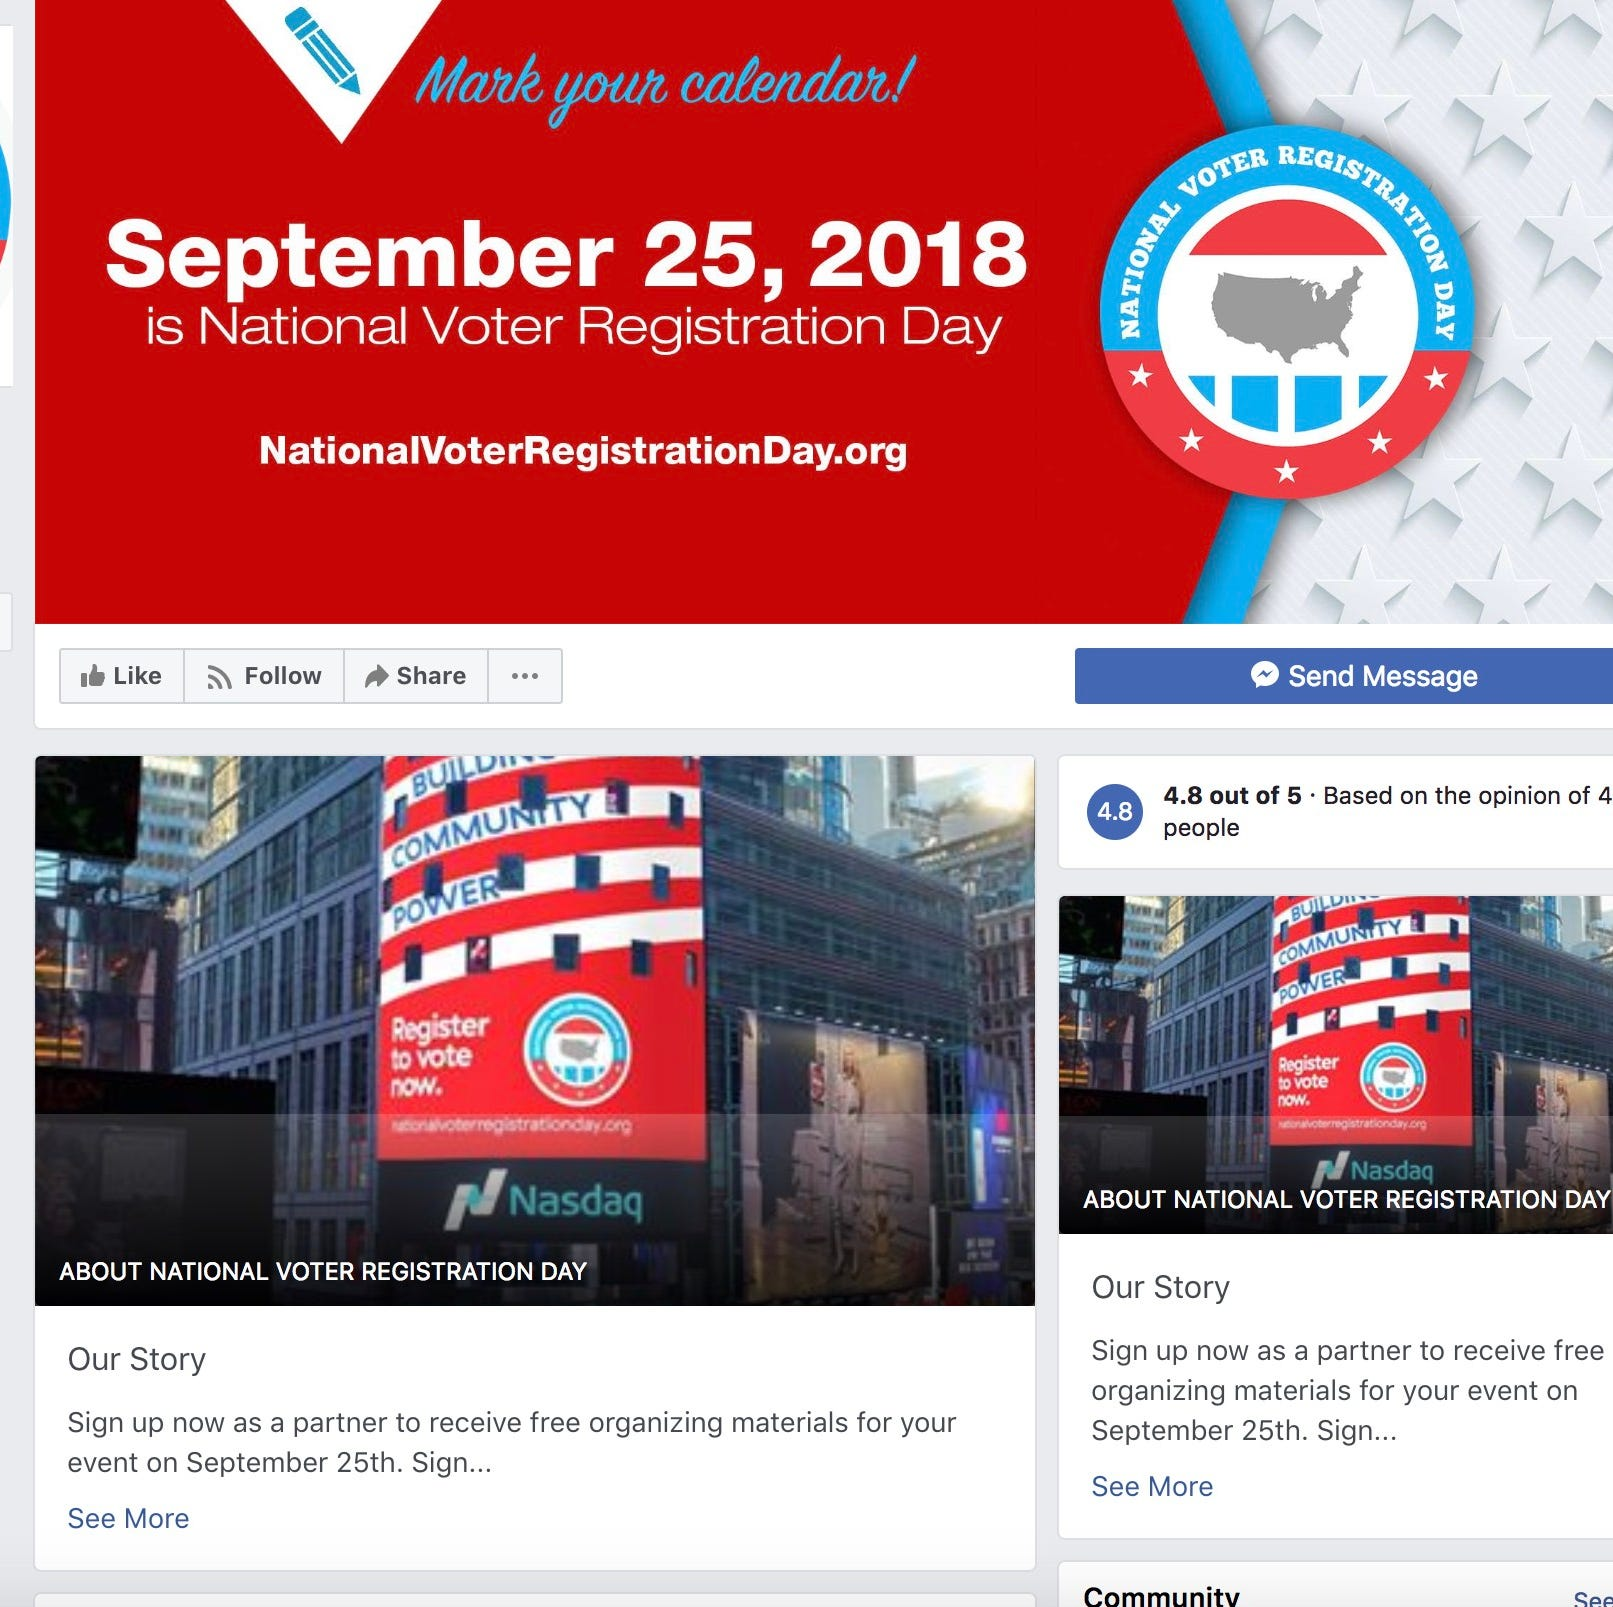 Tech, social media companies encourage voter turnout as November approaches